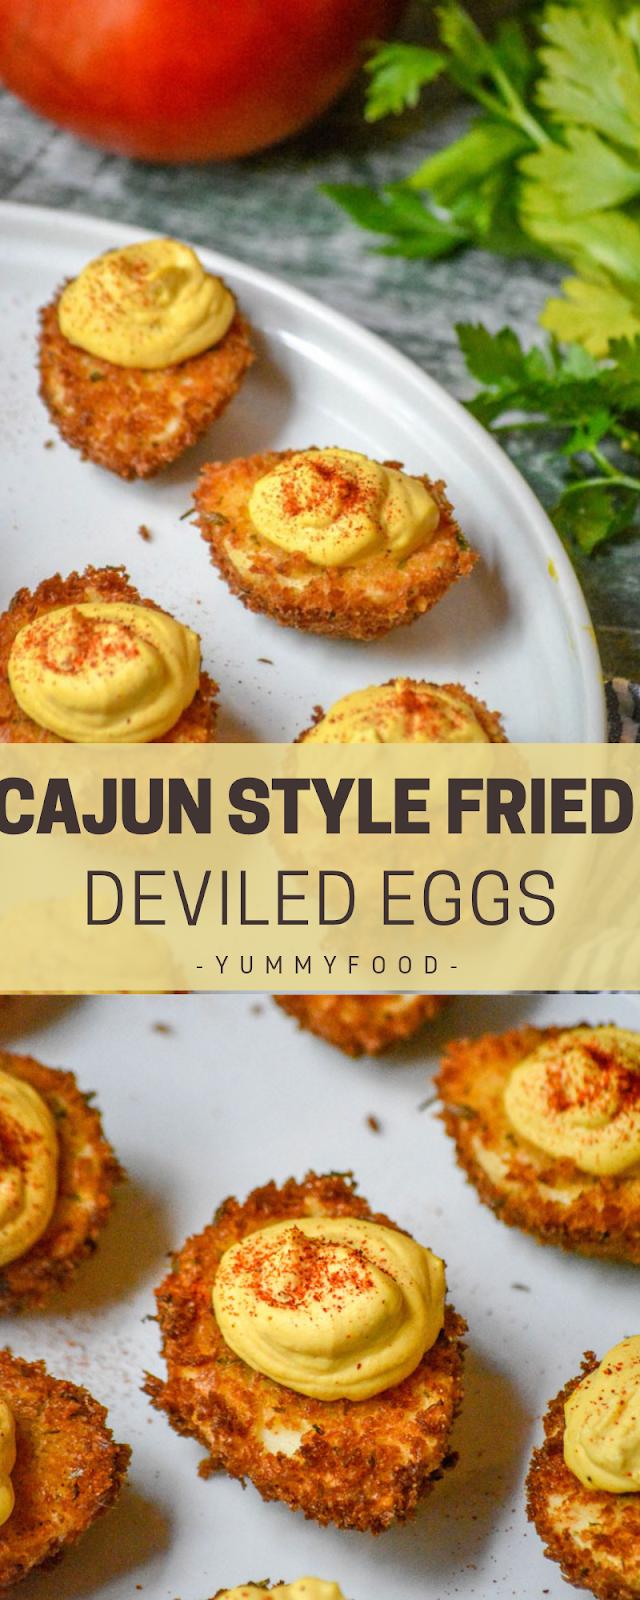 Cajun Design Fried Deviled Eggs